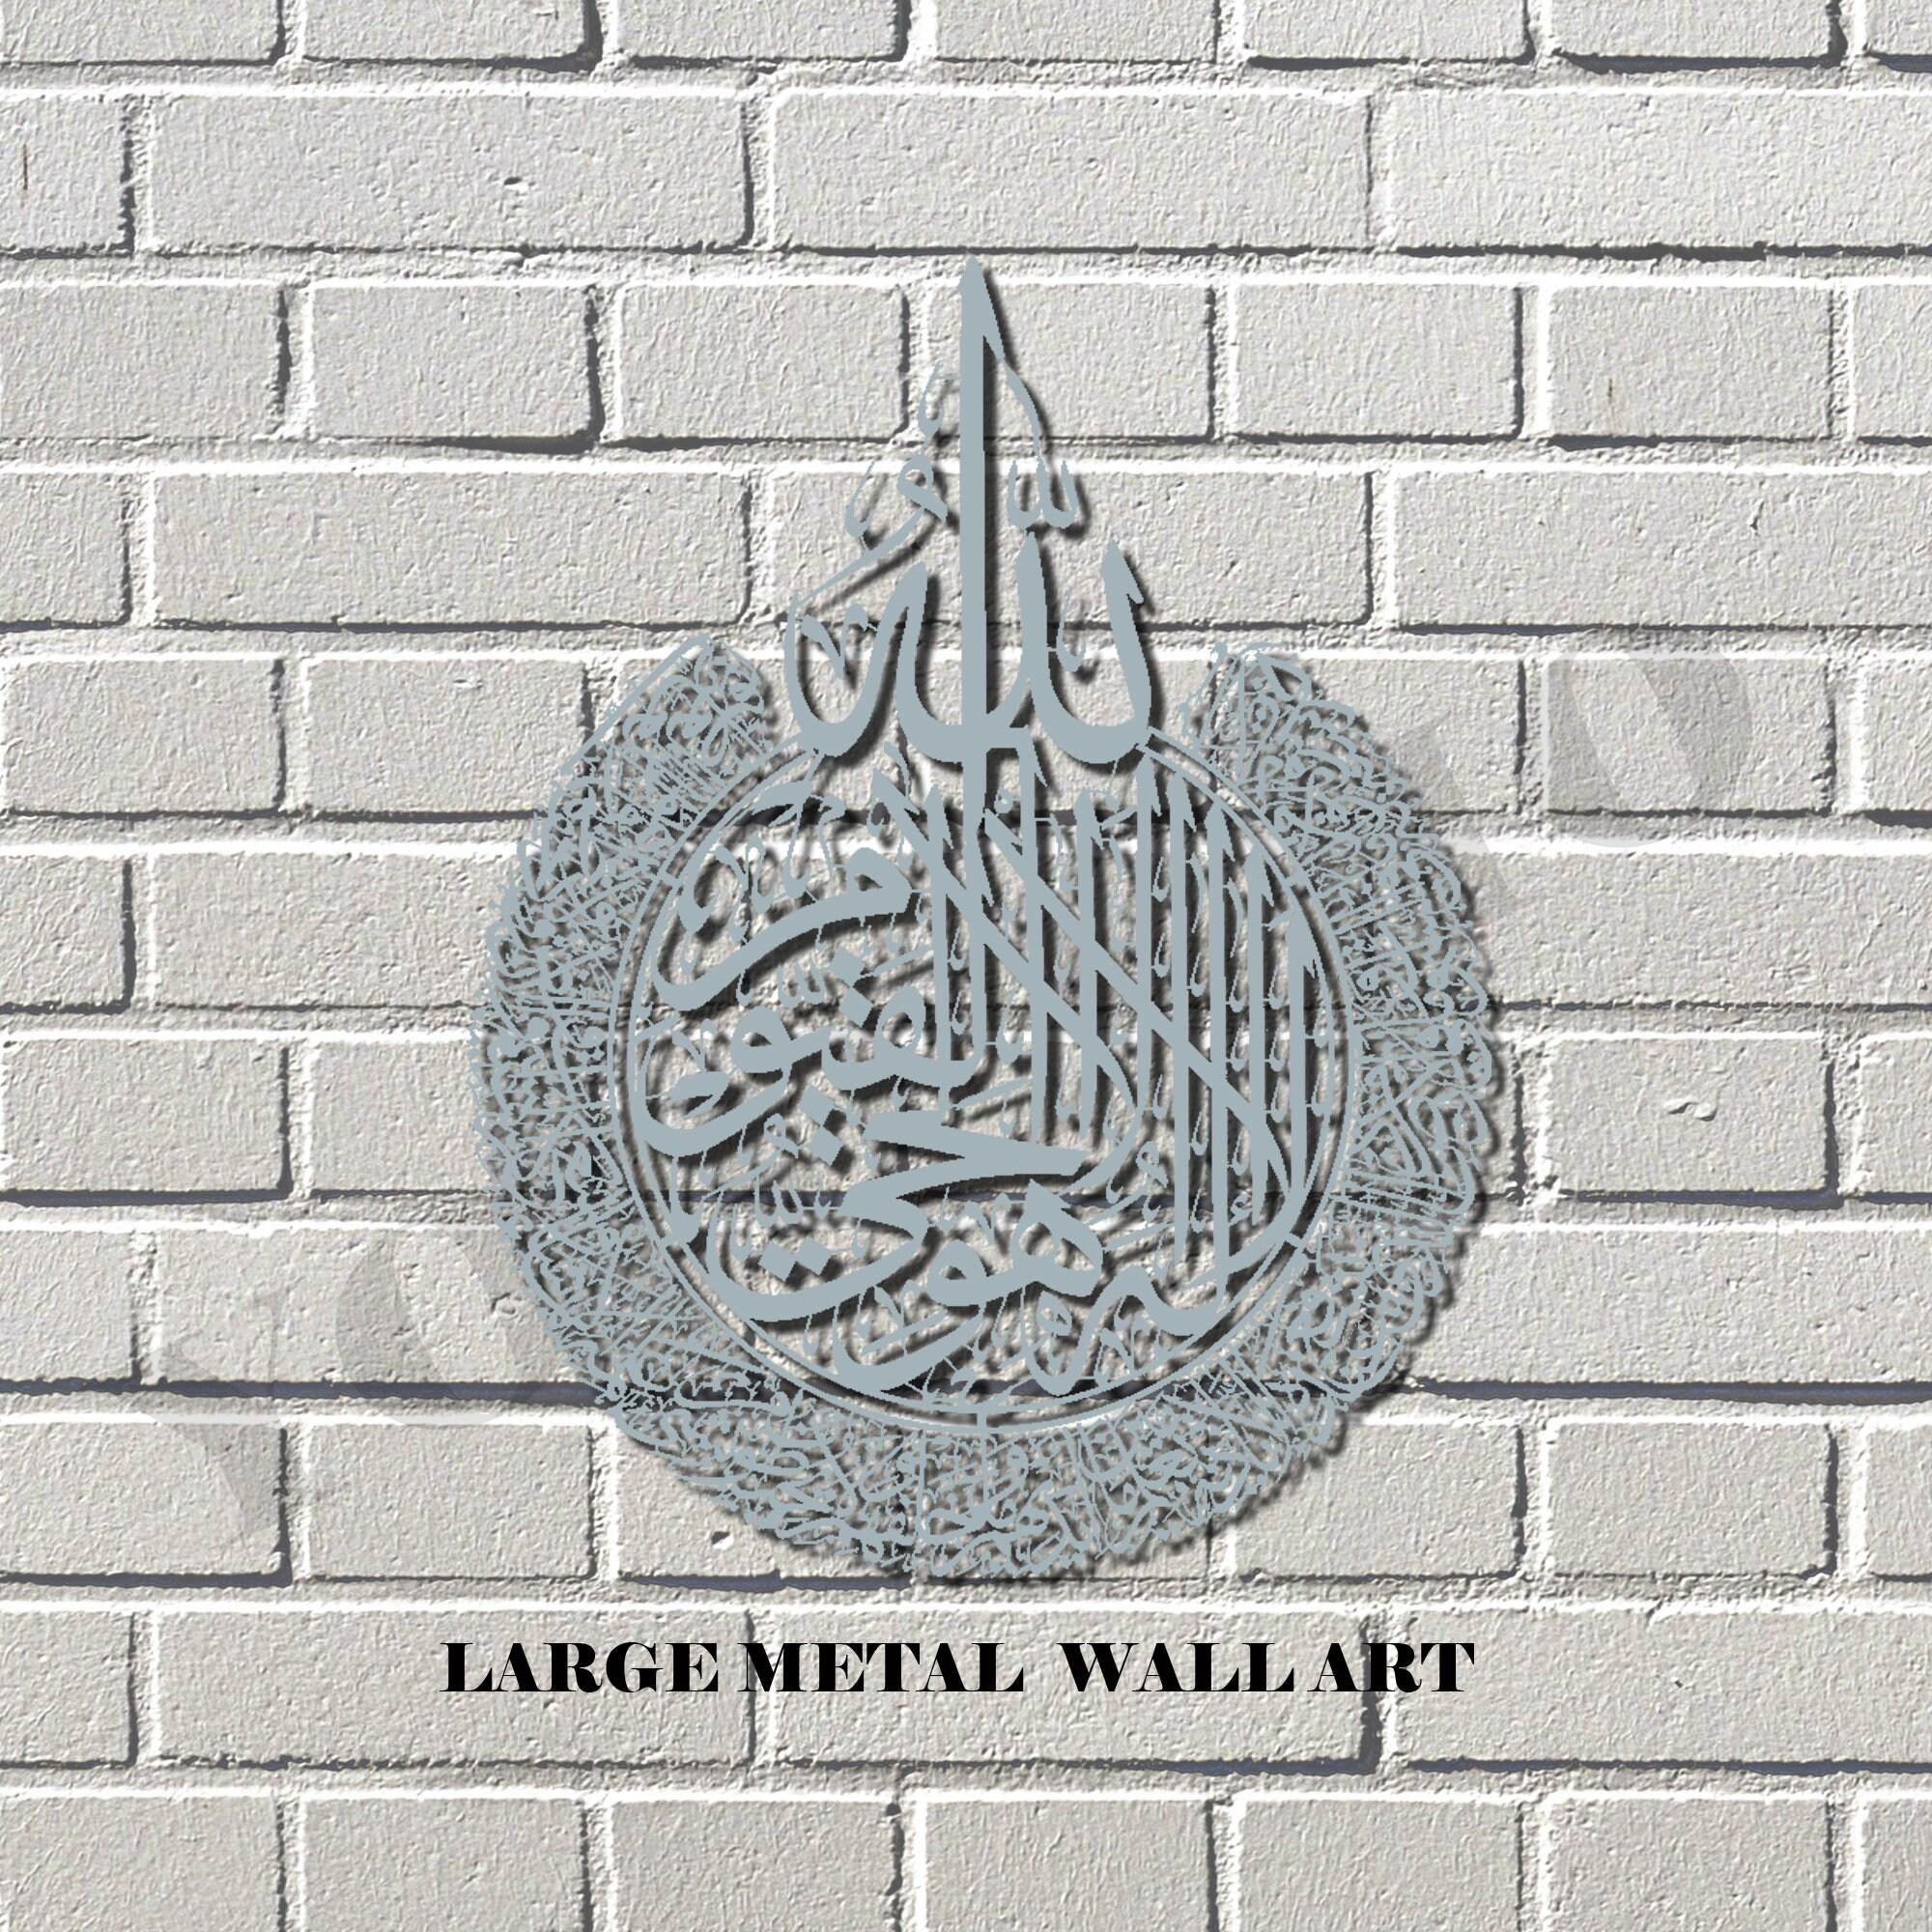 Metal Ayatul Kursi Wall Art Islamic Wall Art Eid Gift